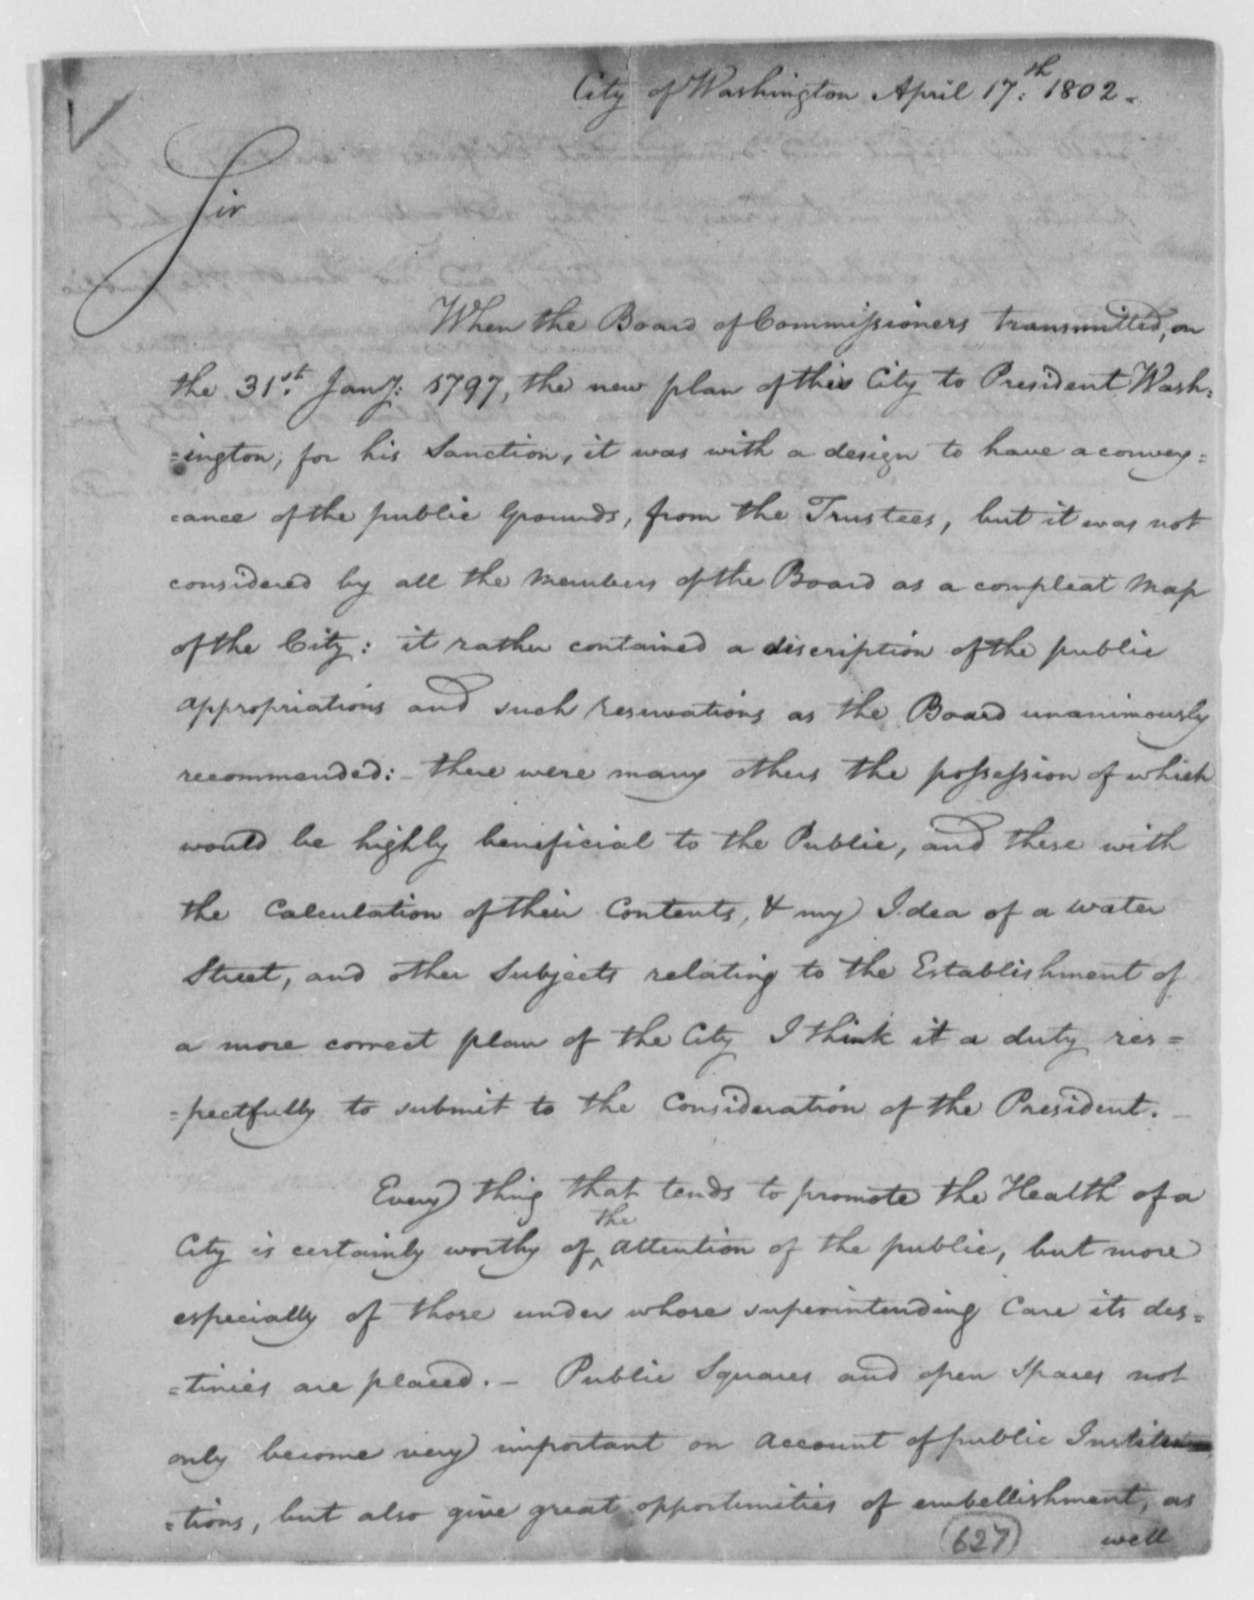 William Thornton, Commissioner to Thomas Jefferson, April 17, 1802